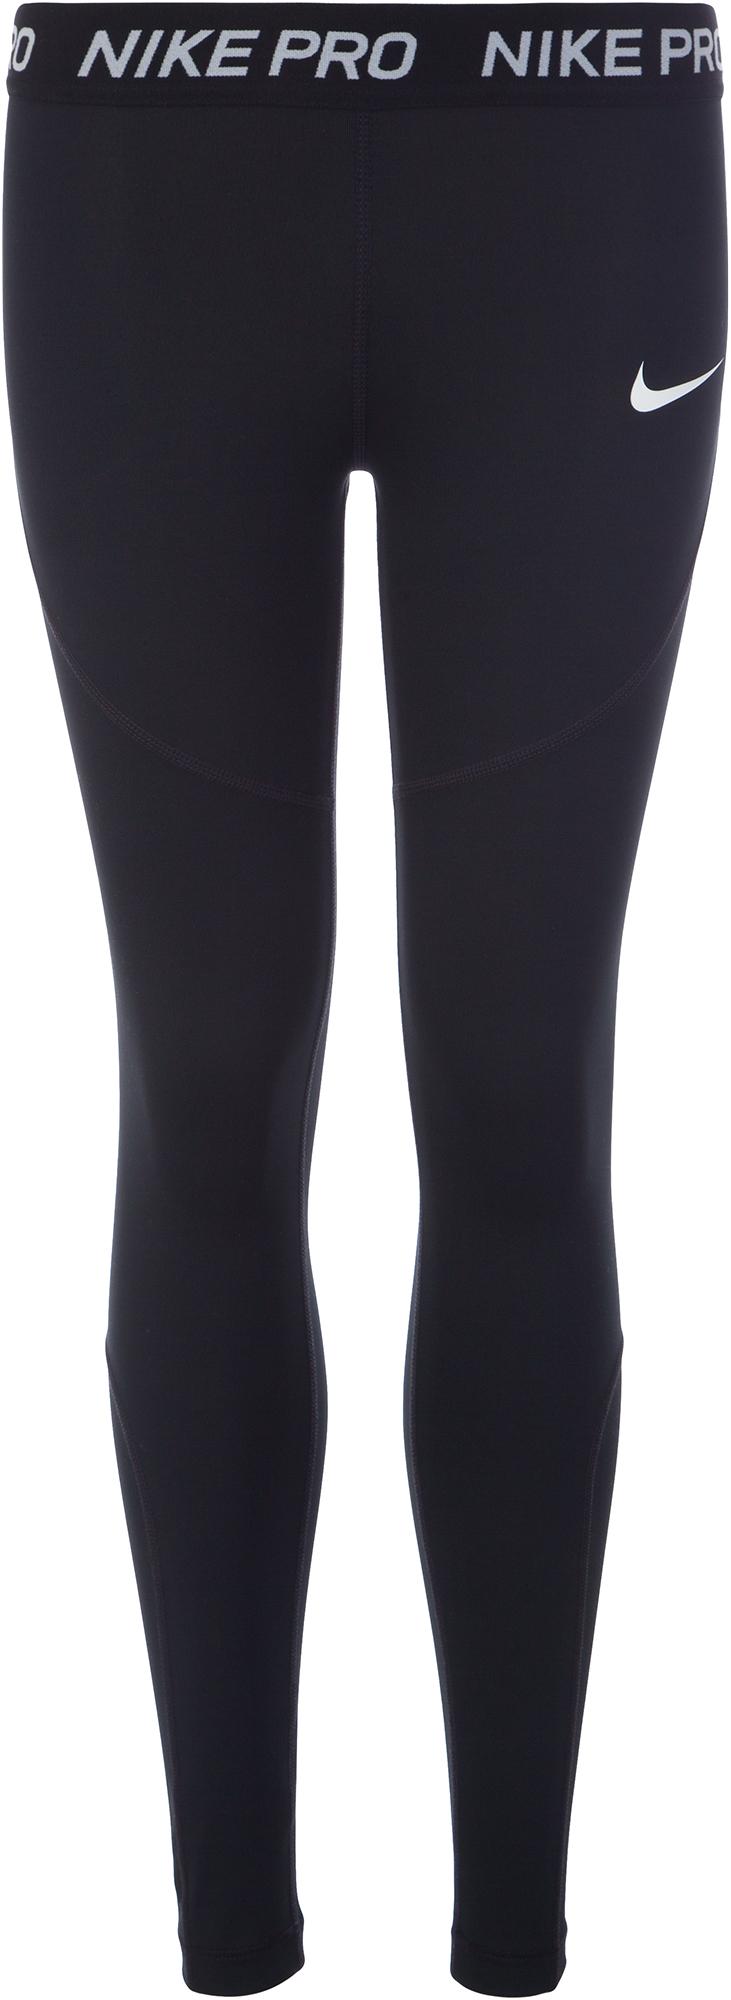 Nike Легинсы для девочек Nike Pro, размер 156-164 одежда для занятий баскетболом nike 005027 11 diy